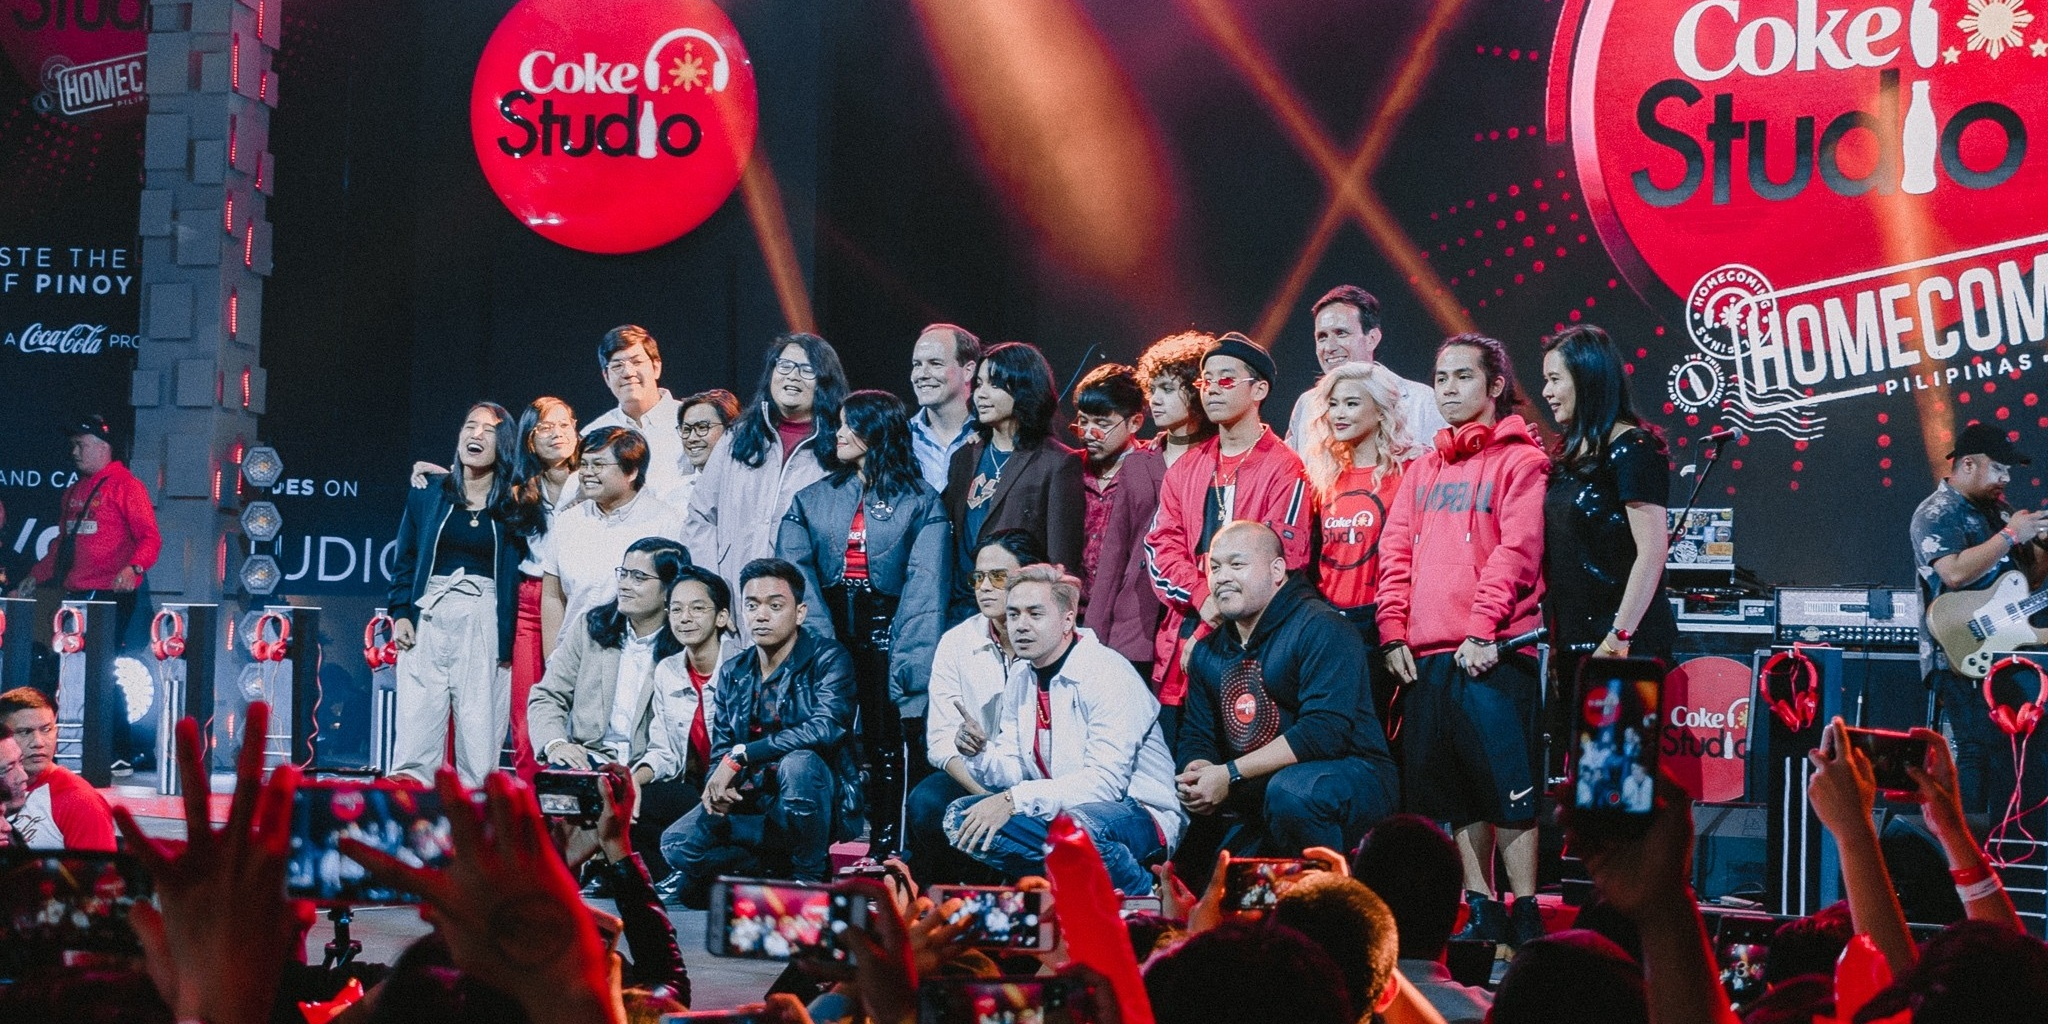 Coke Studio Homecoming lineup revealed: IV of Spades, QUEST, Ben&Ben, Juan Miguel Severo, and more